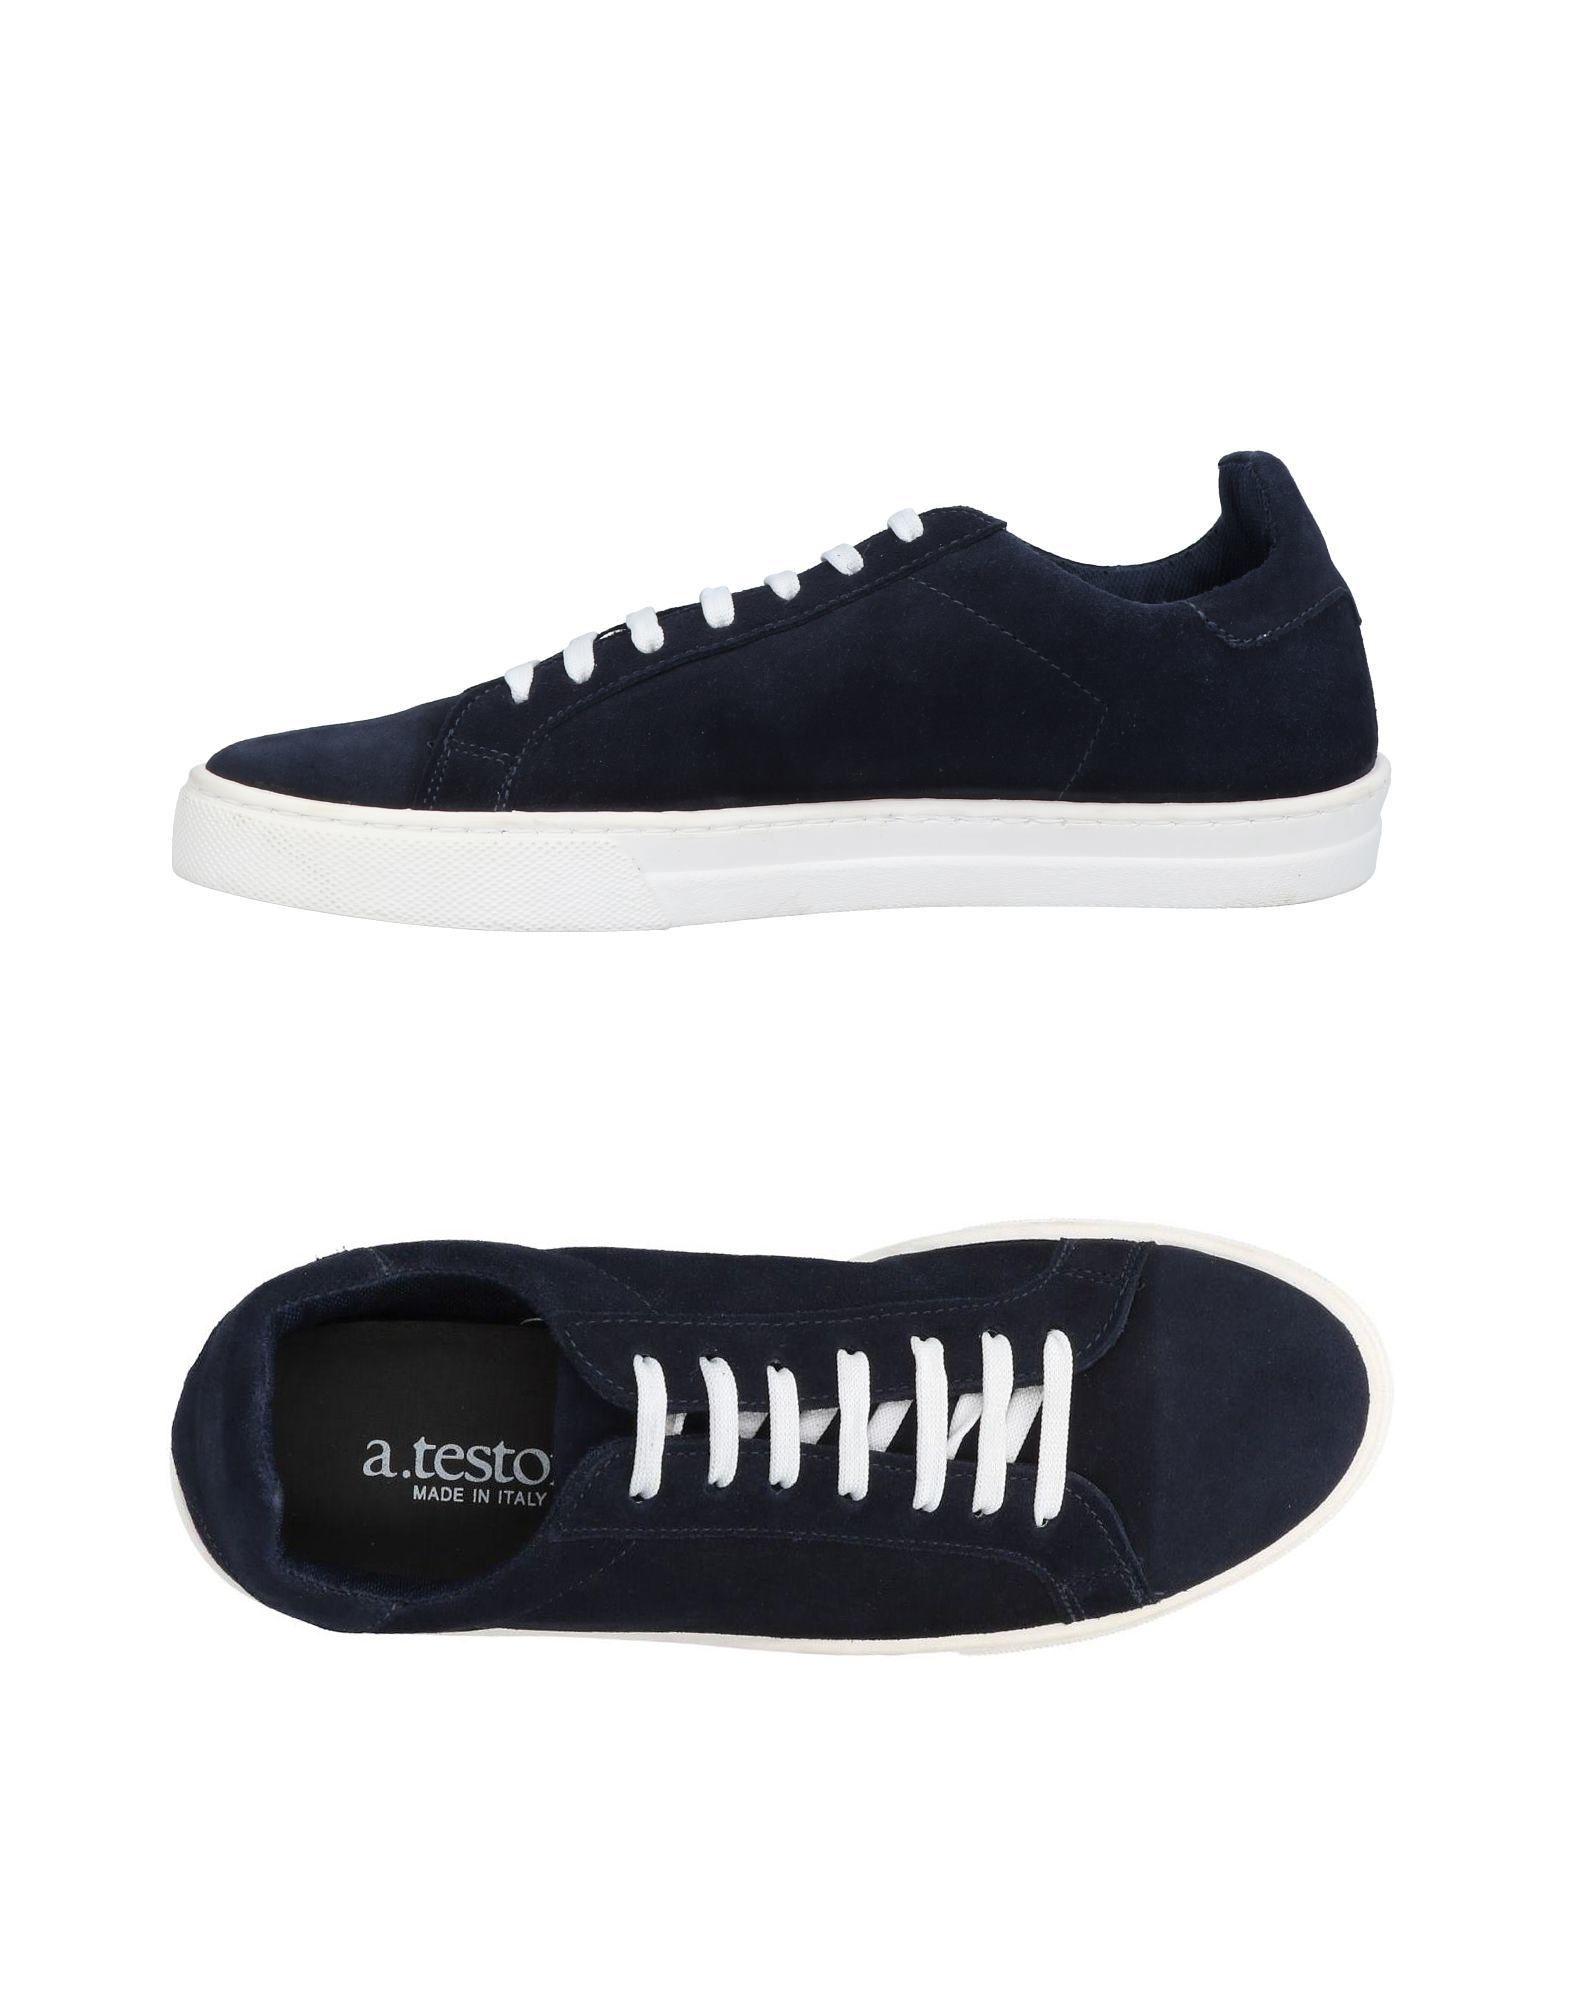 Rabatt Schuhe echte Schuhe Rabatt A.Testoni Sneakers Herren  11459172HT 986df0